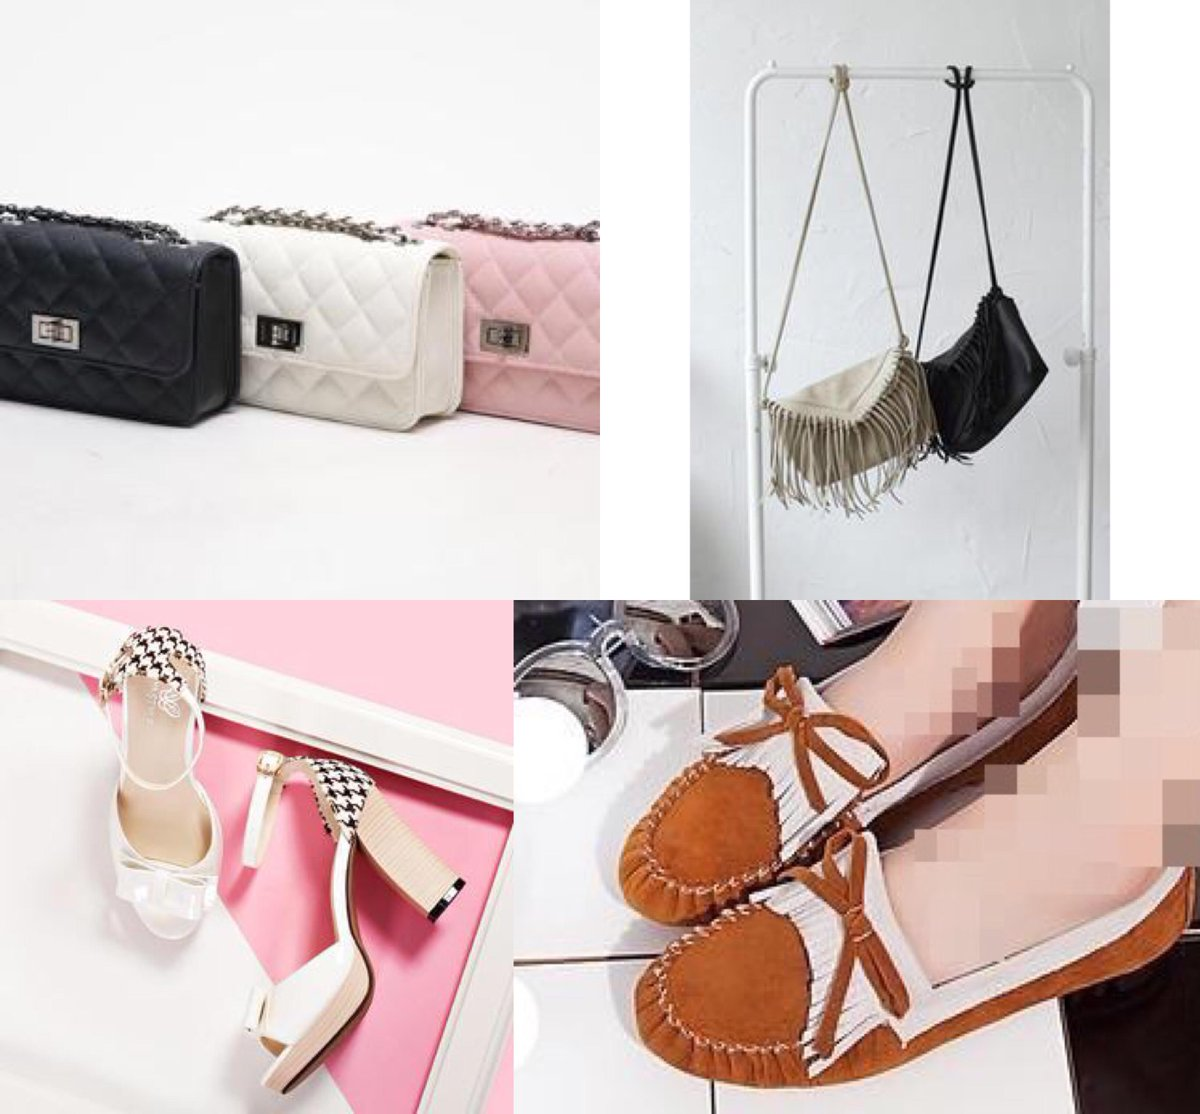 1aa689cf8 موقع ياباني يوفر ملابس للرجال والنساء بستايلات جميلة جداً وأسعار ممتازه  أعجبني يشحن دولي http://www.yesstyle.com/en/ .pic.twitter.com/PT3eKxNvX3